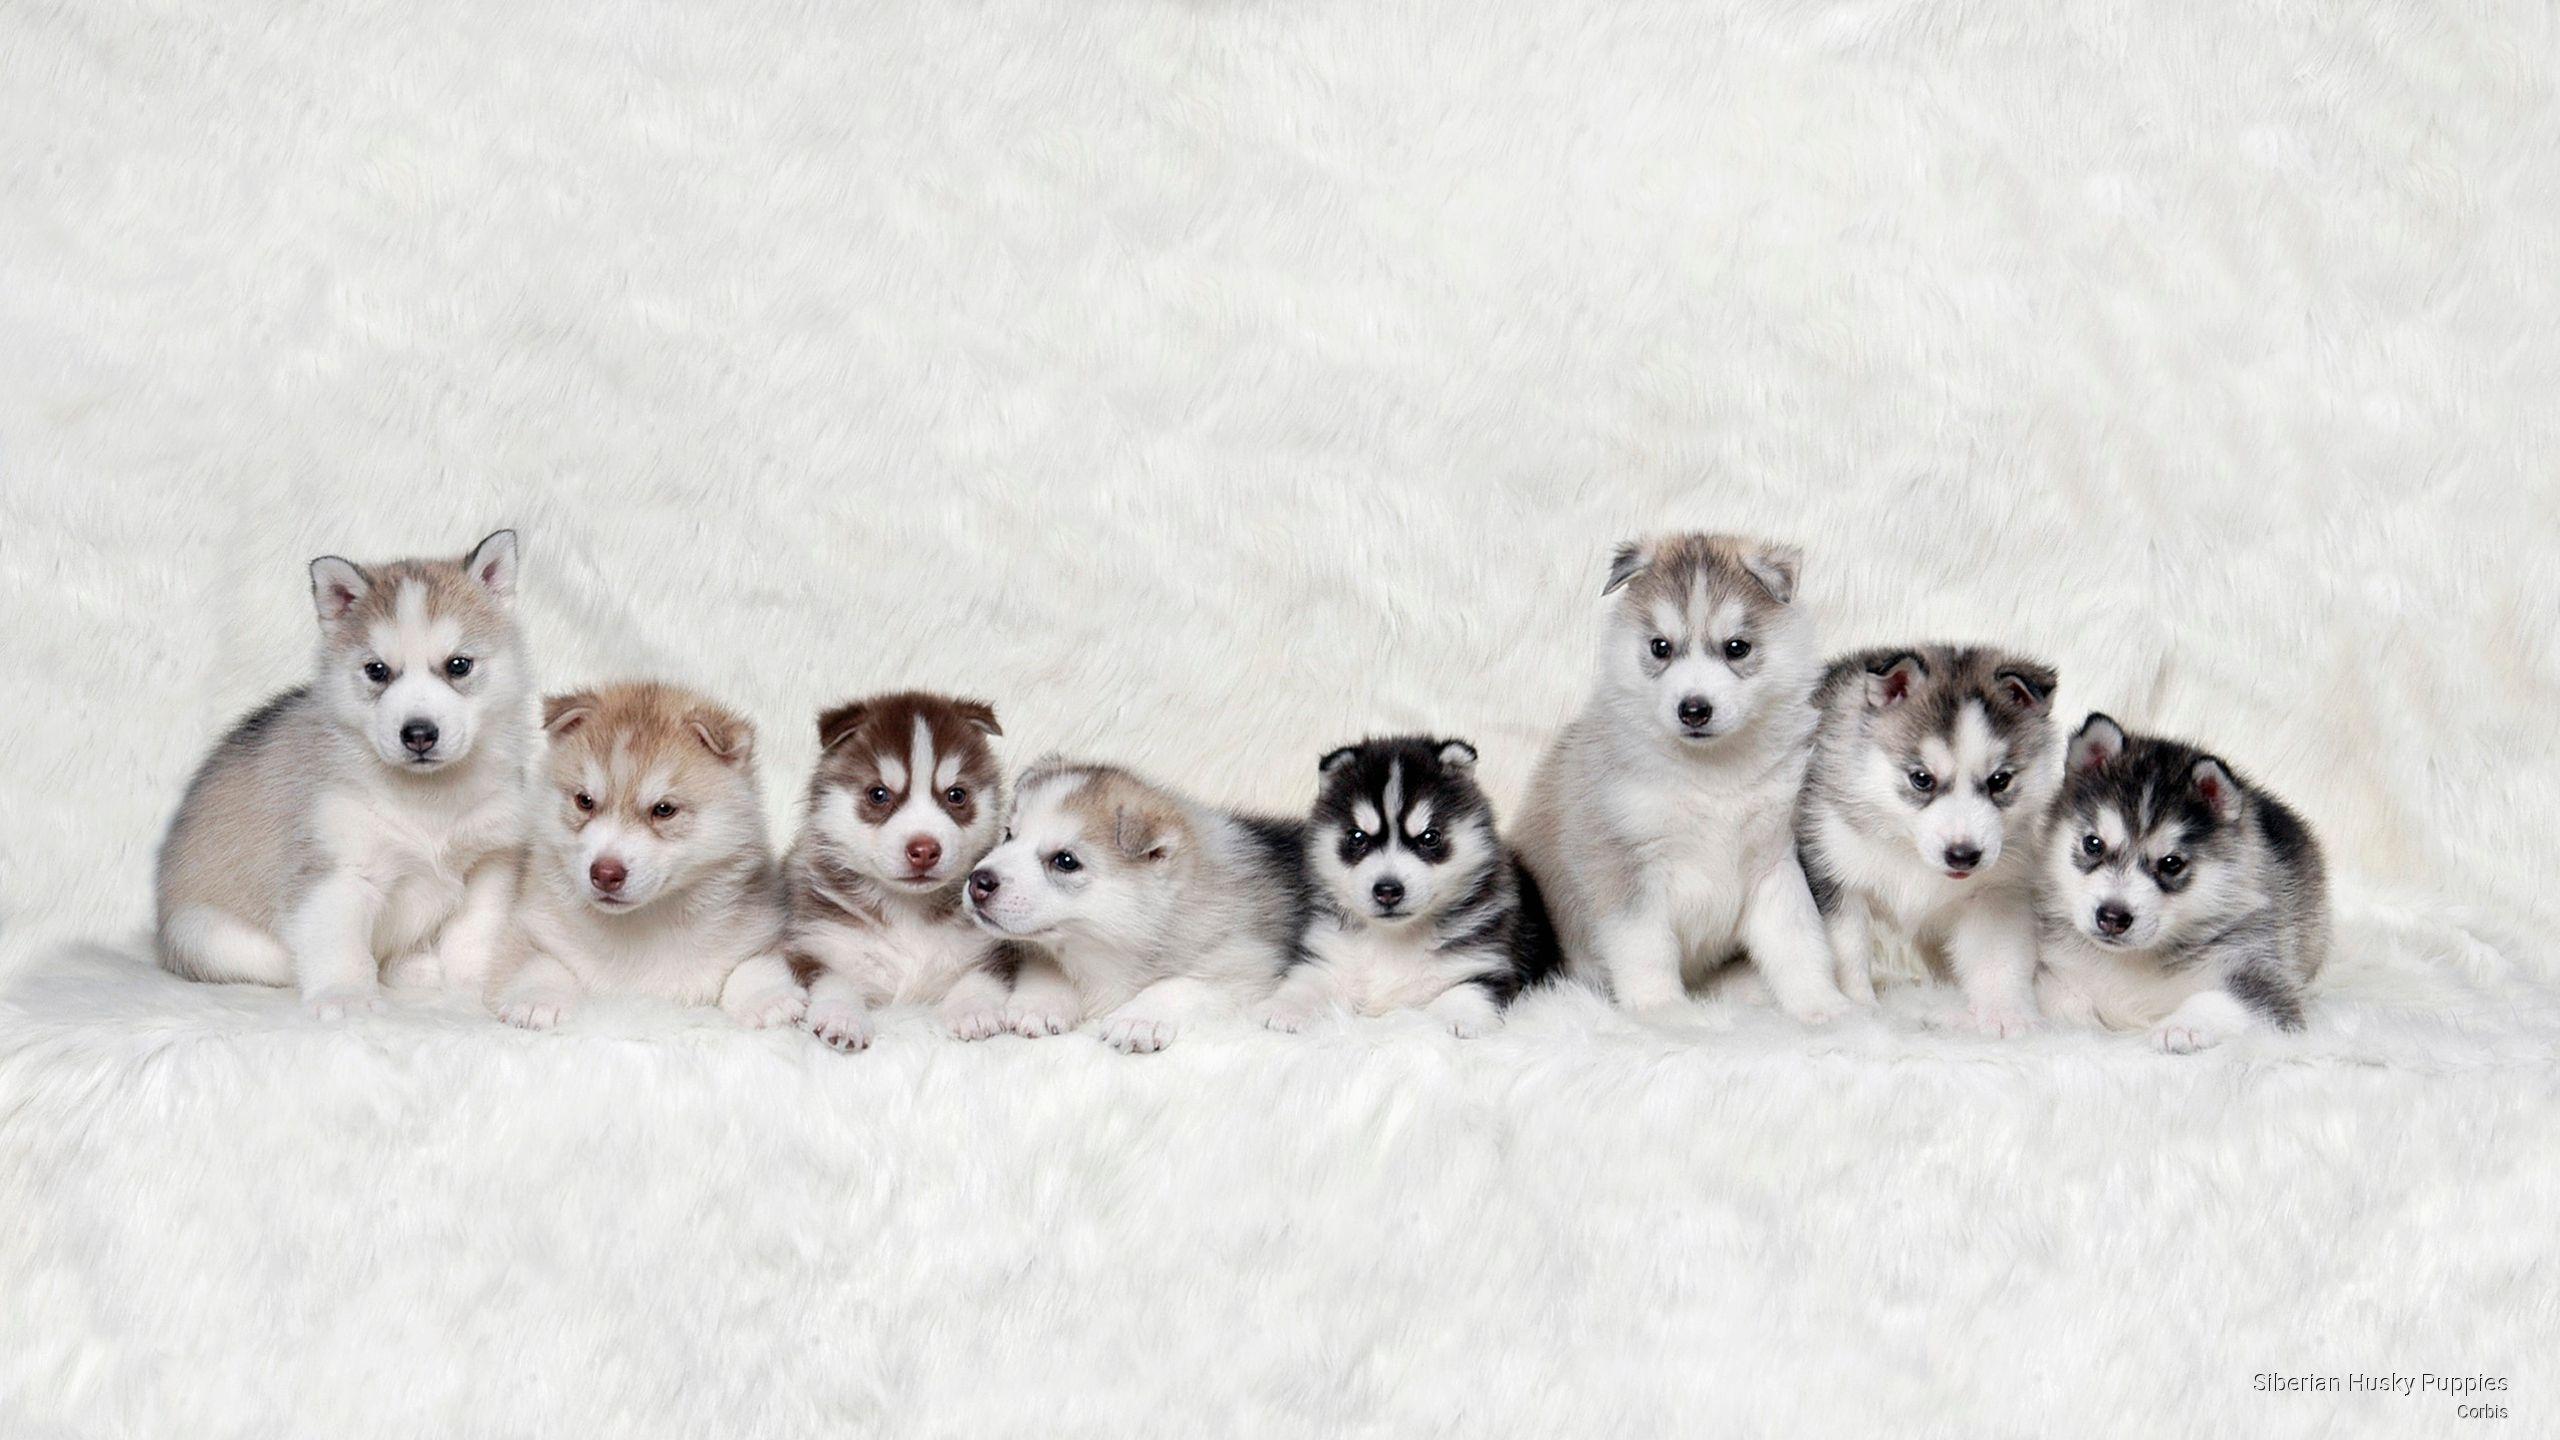 huskies Siberian husky puppies, Dog wallpaper, Husky puppy